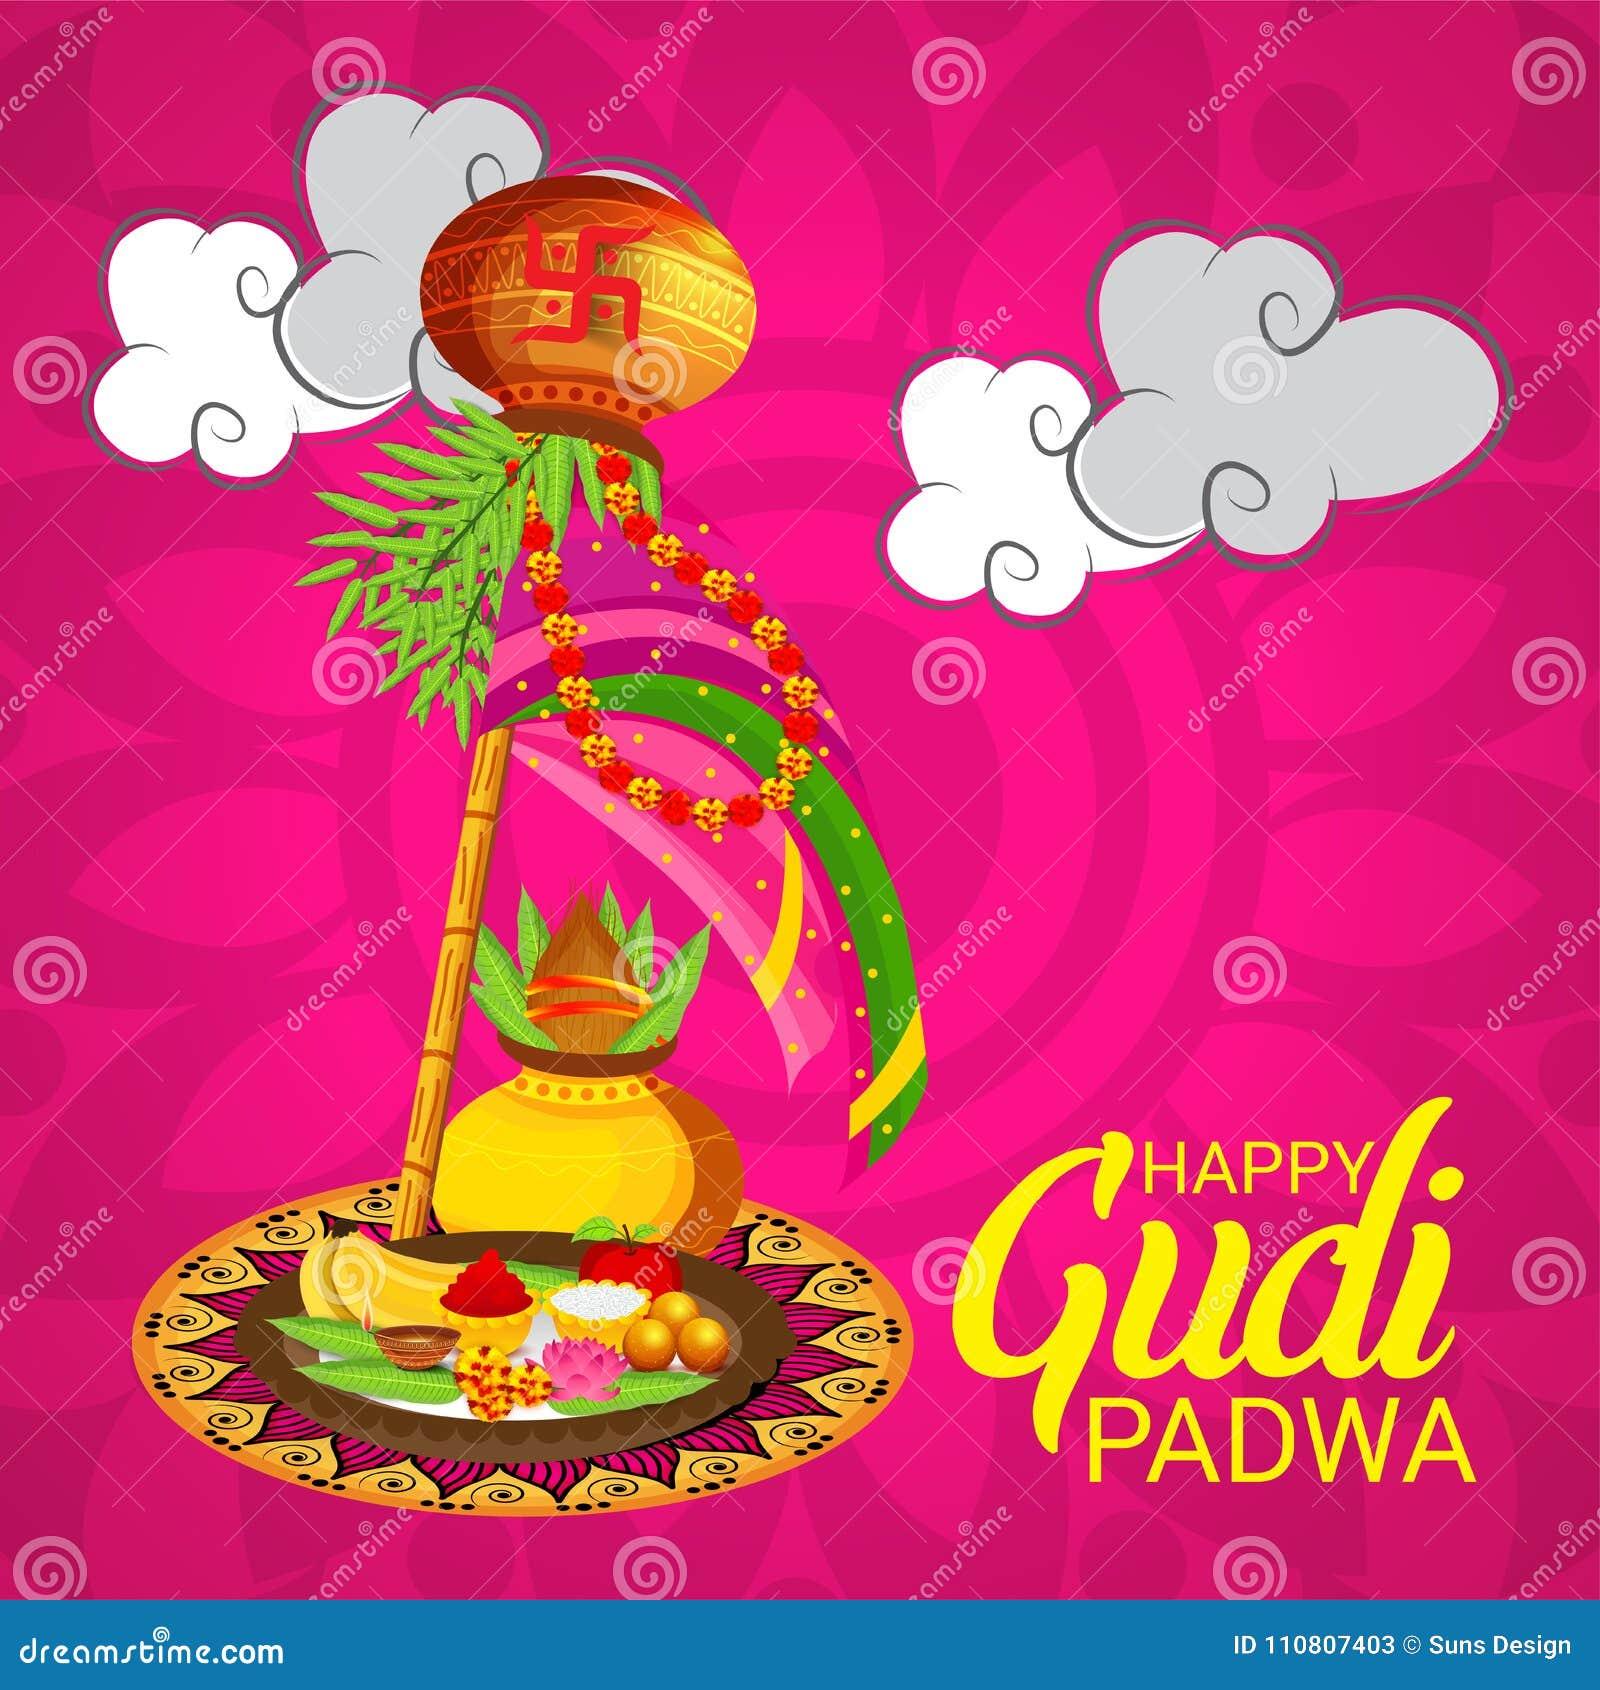 Happy Gudi Padwa Marathi New Year Stock Illustration Illustration